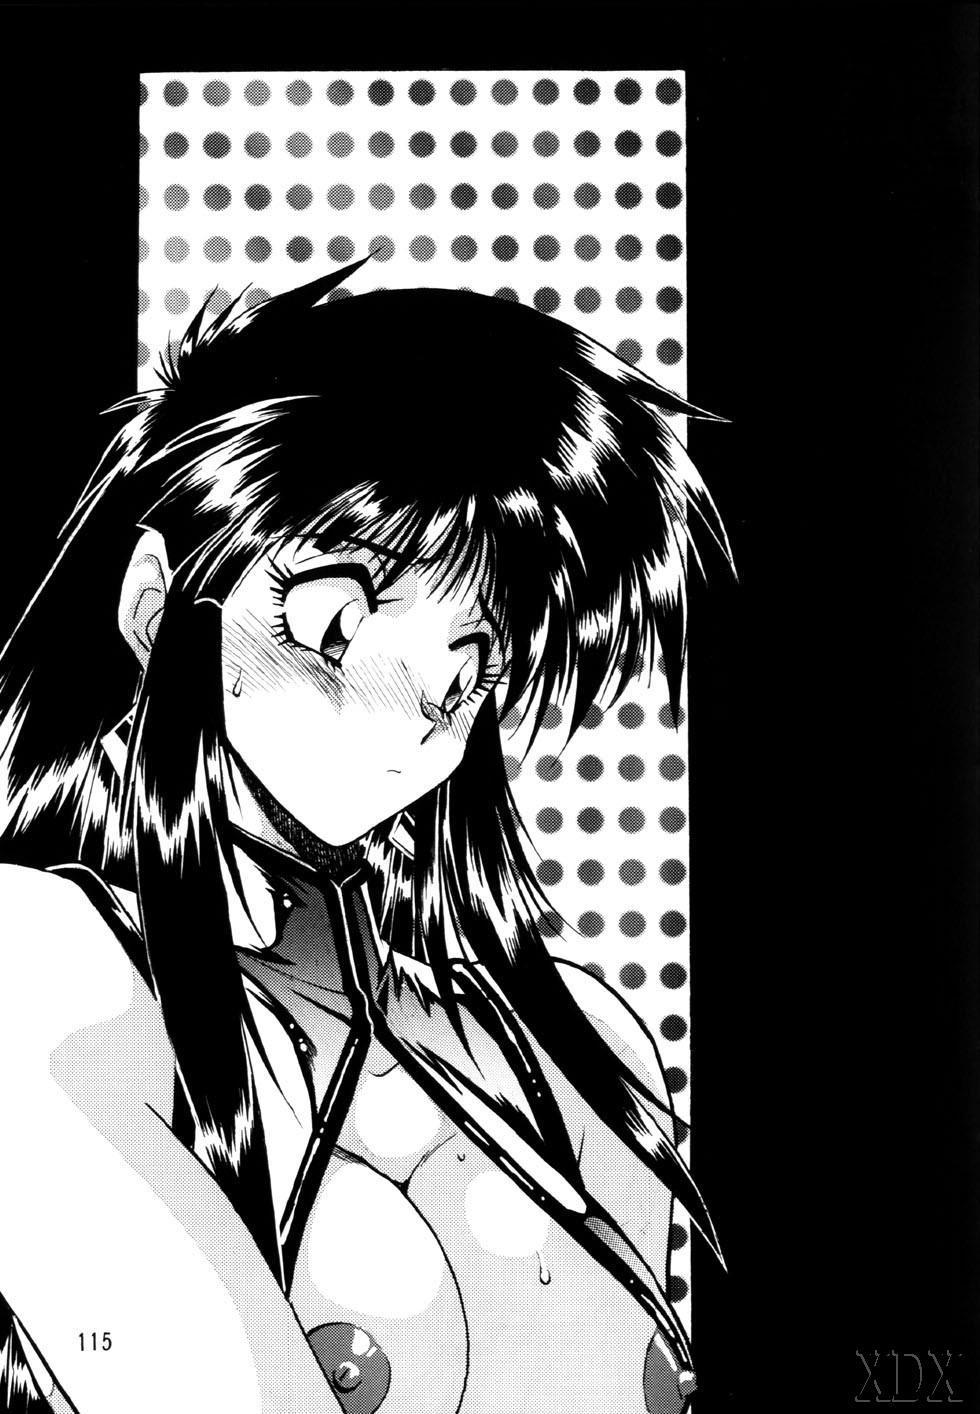 (C66) [Studio Katsudon (Manabe Jouji)] Imasara Dirty Pair Soushuuhen (Dirty Pair) [English] ==DesuDesu== 114